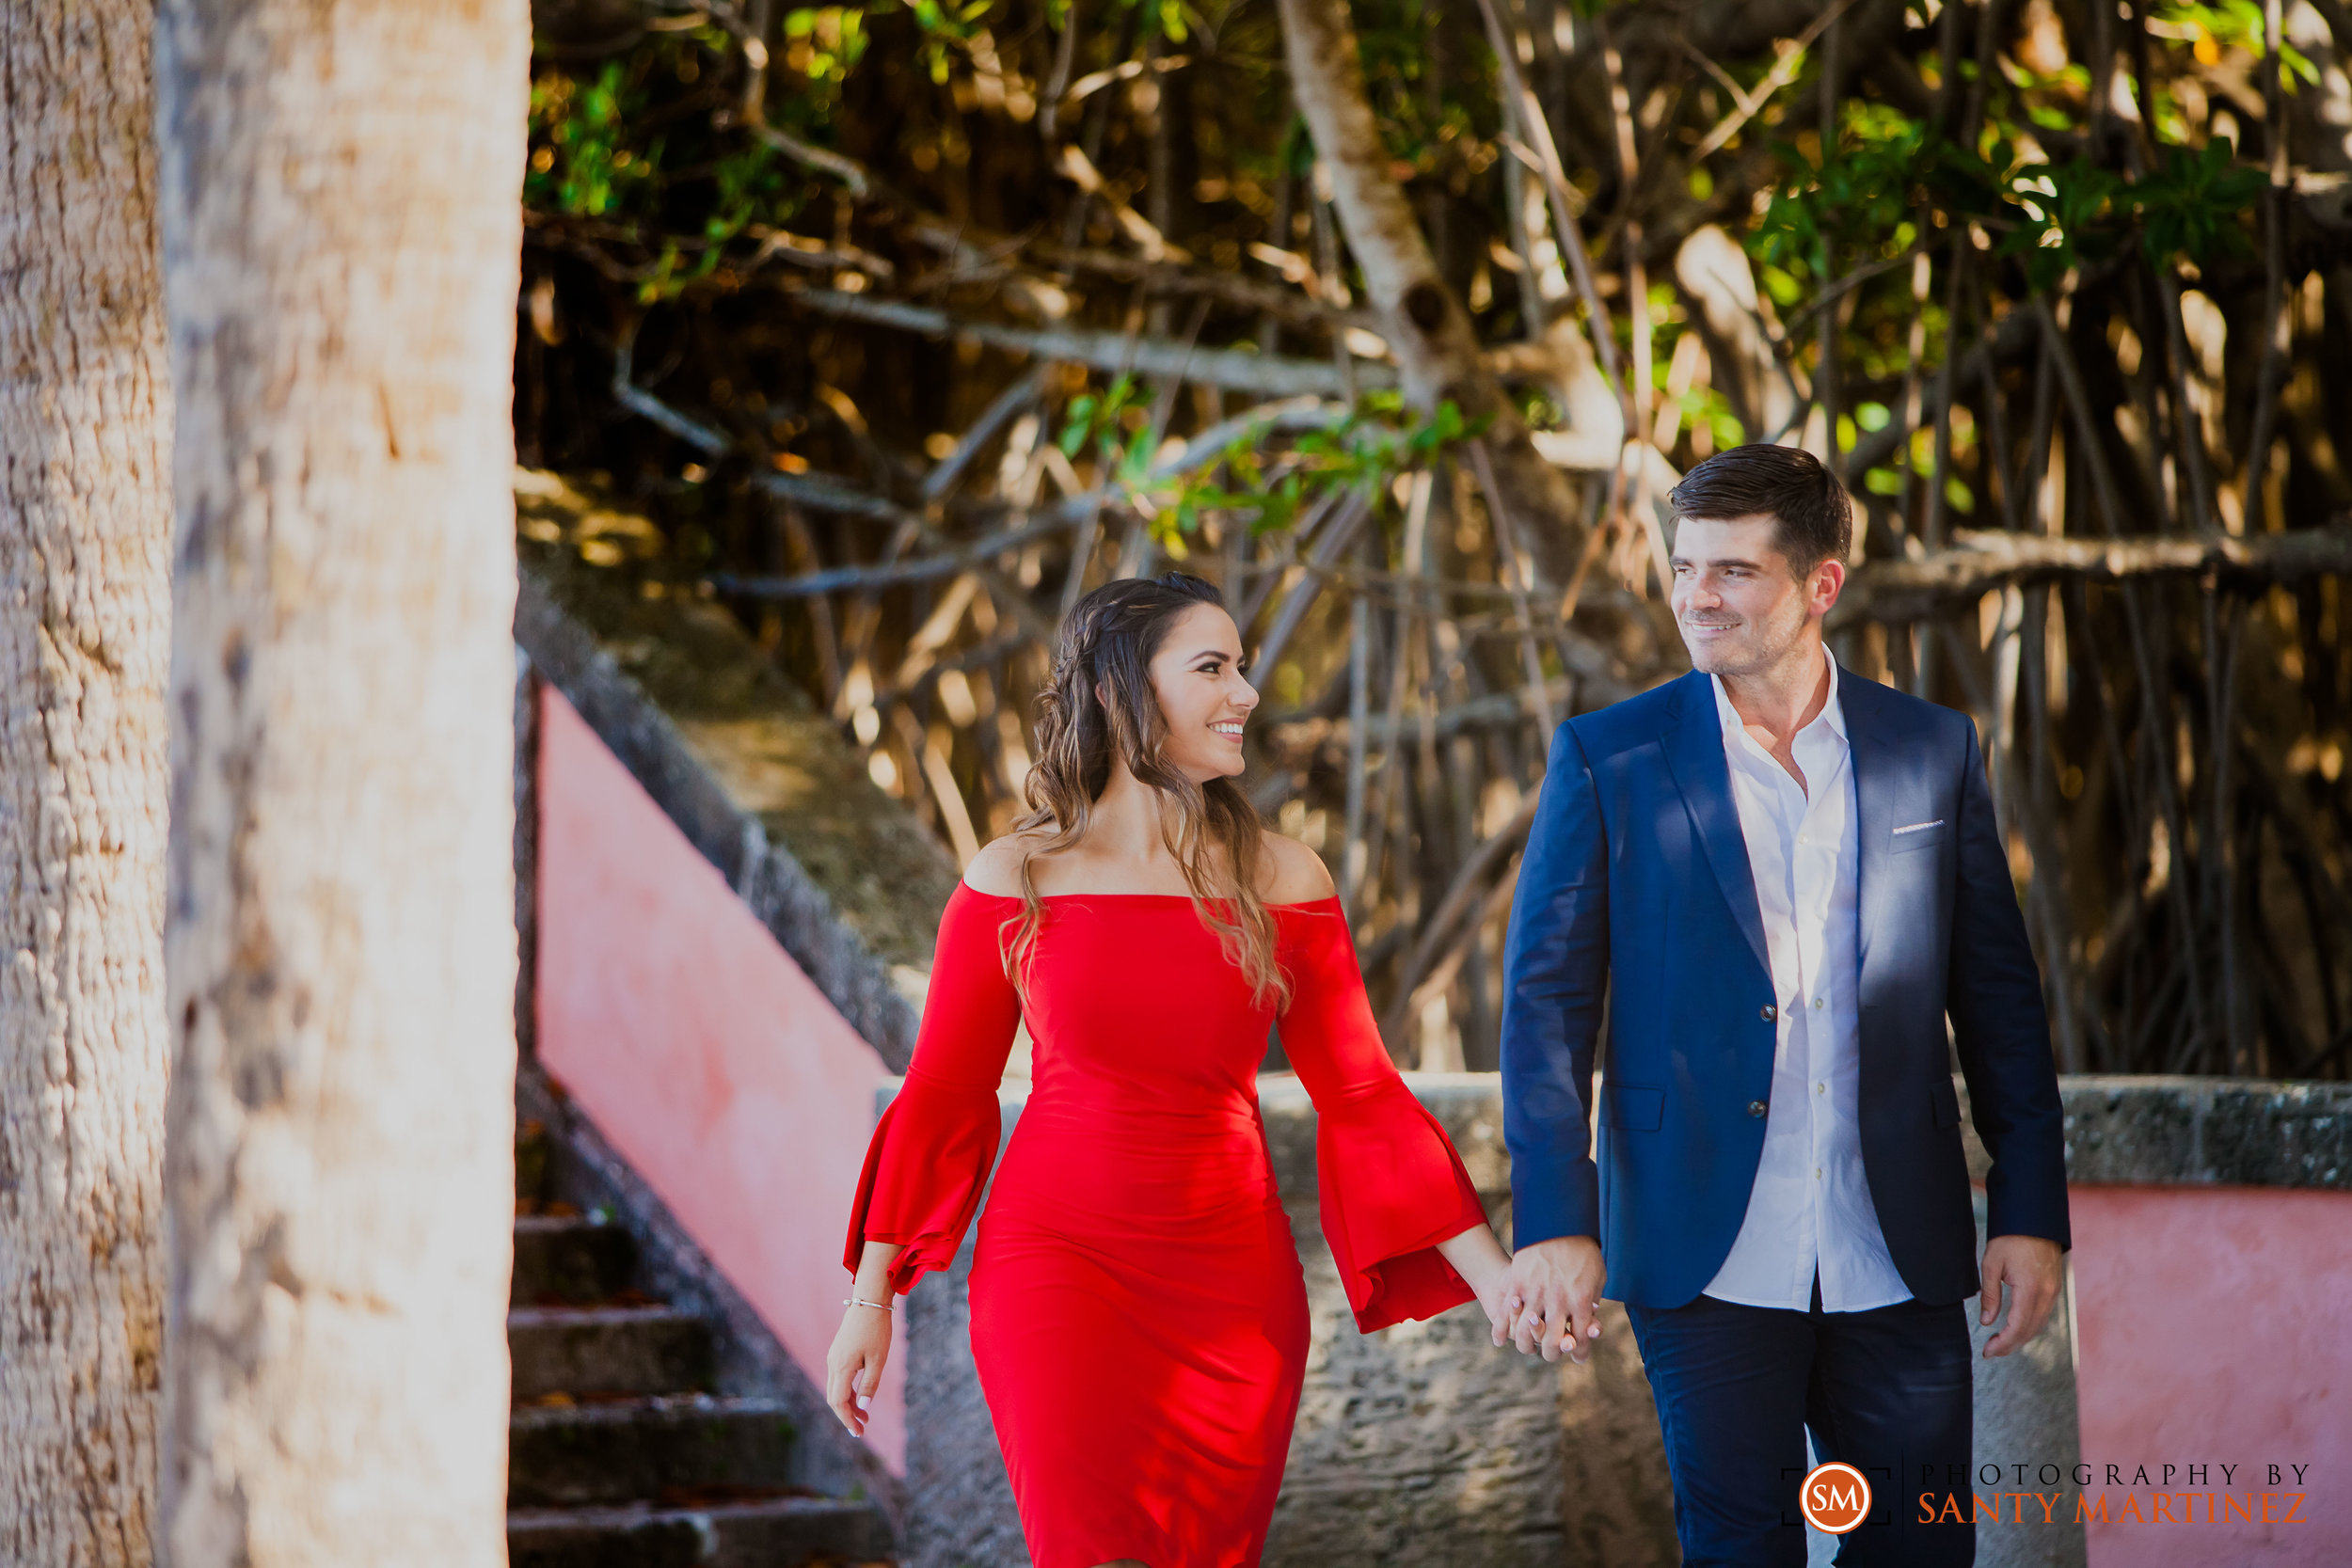 Engagement Session - Vizcaya - Photography by Santy Martinez-13.jpg